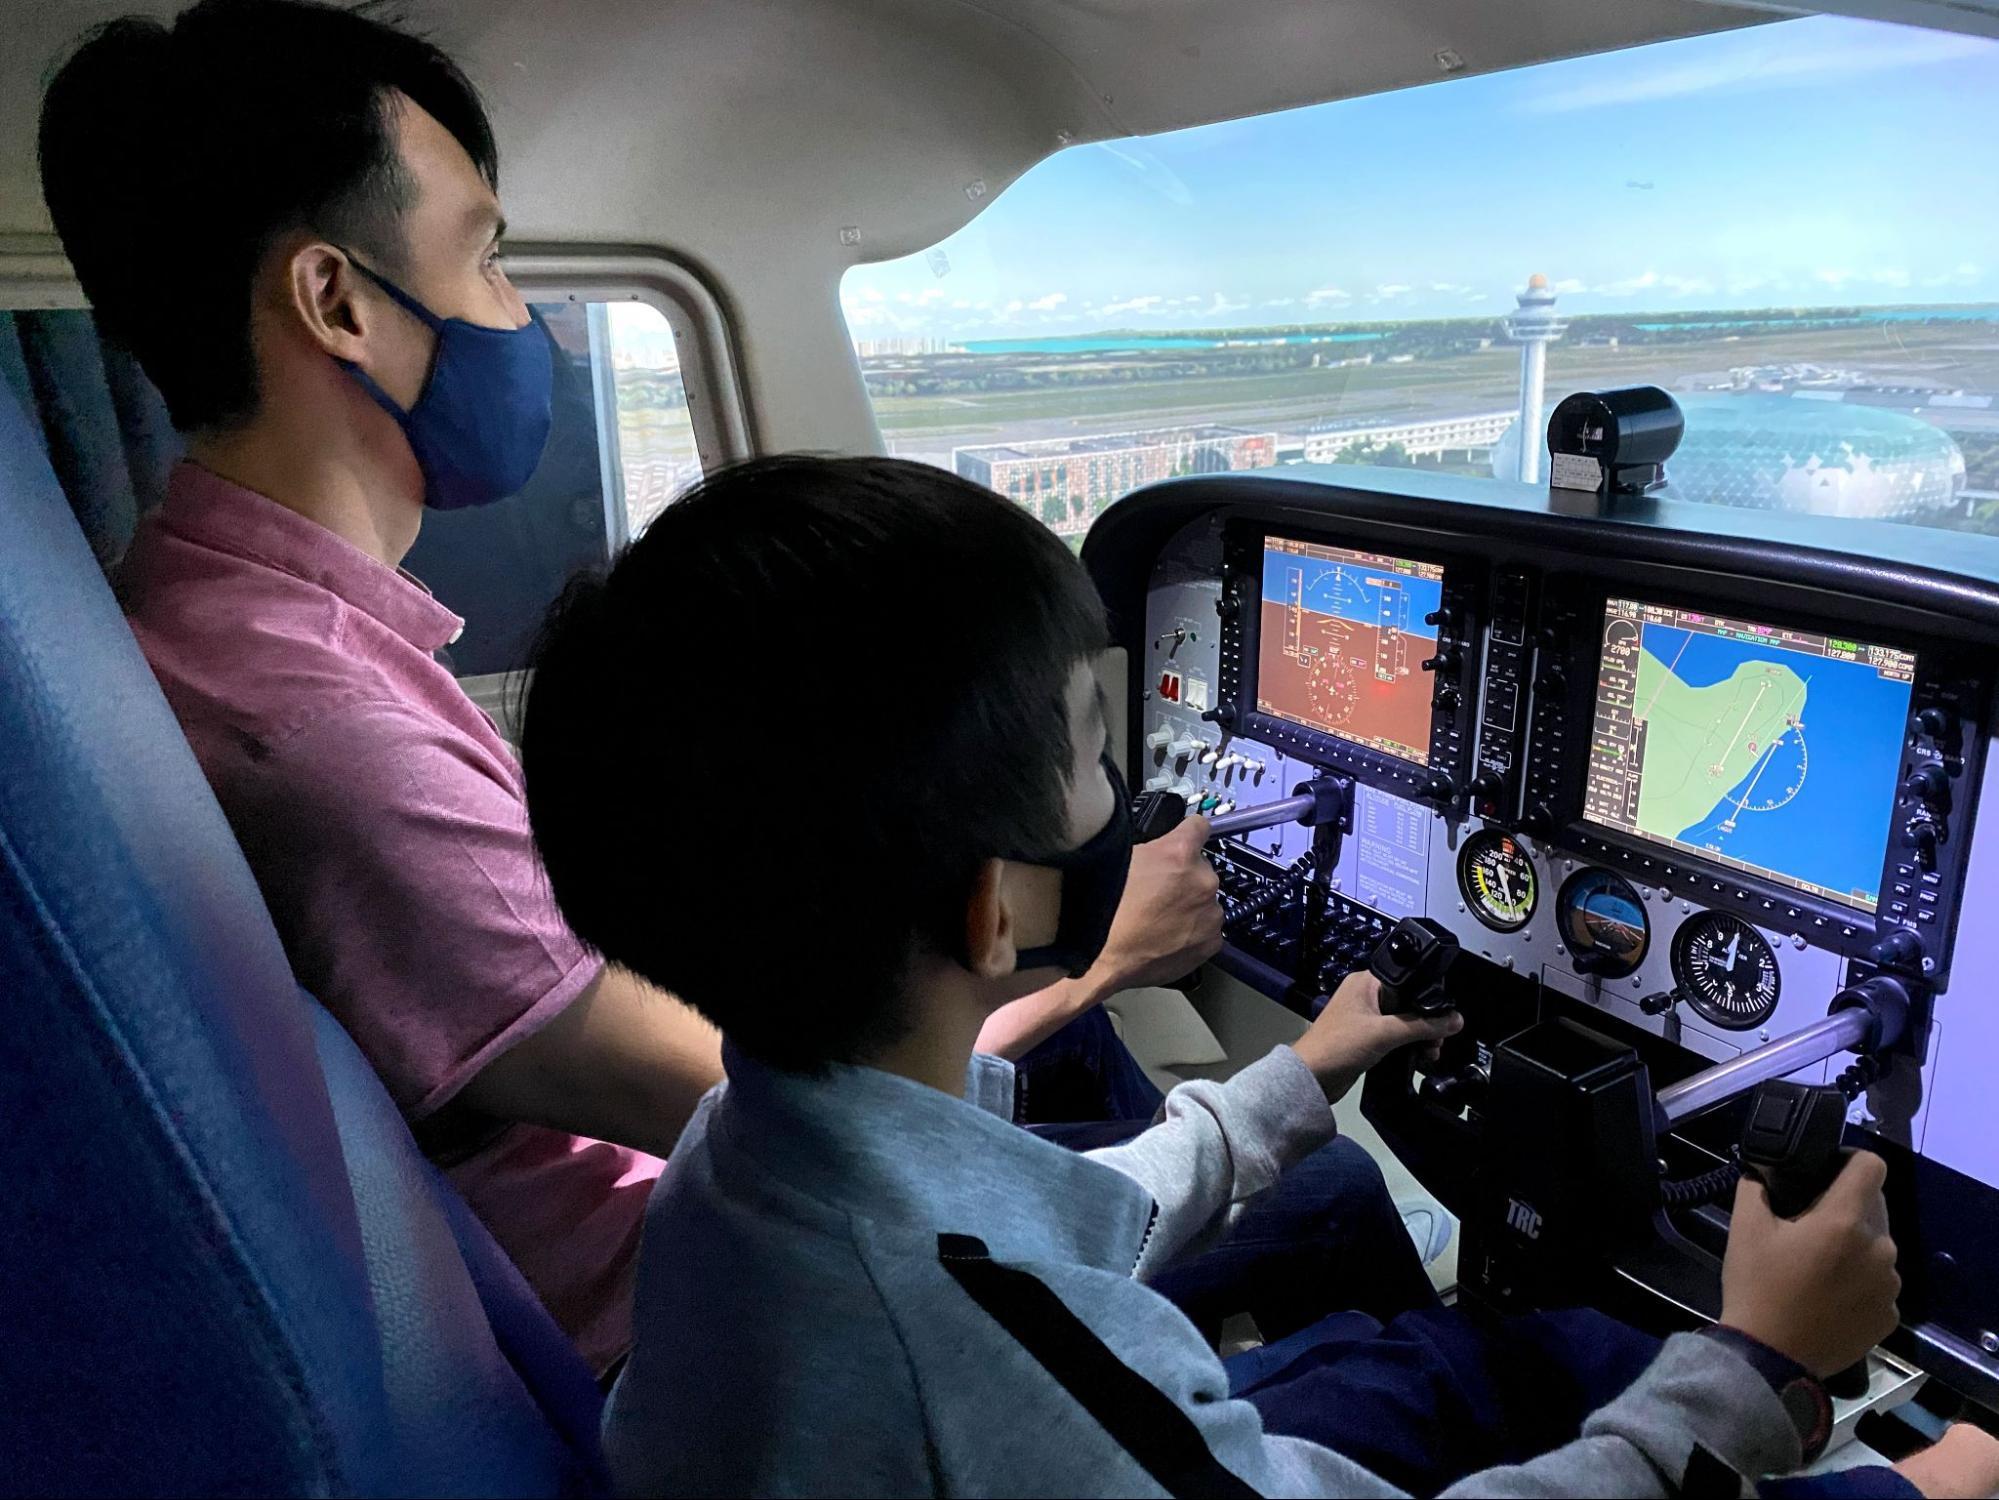 Take Flight At Changi Airport - flight simulation experience